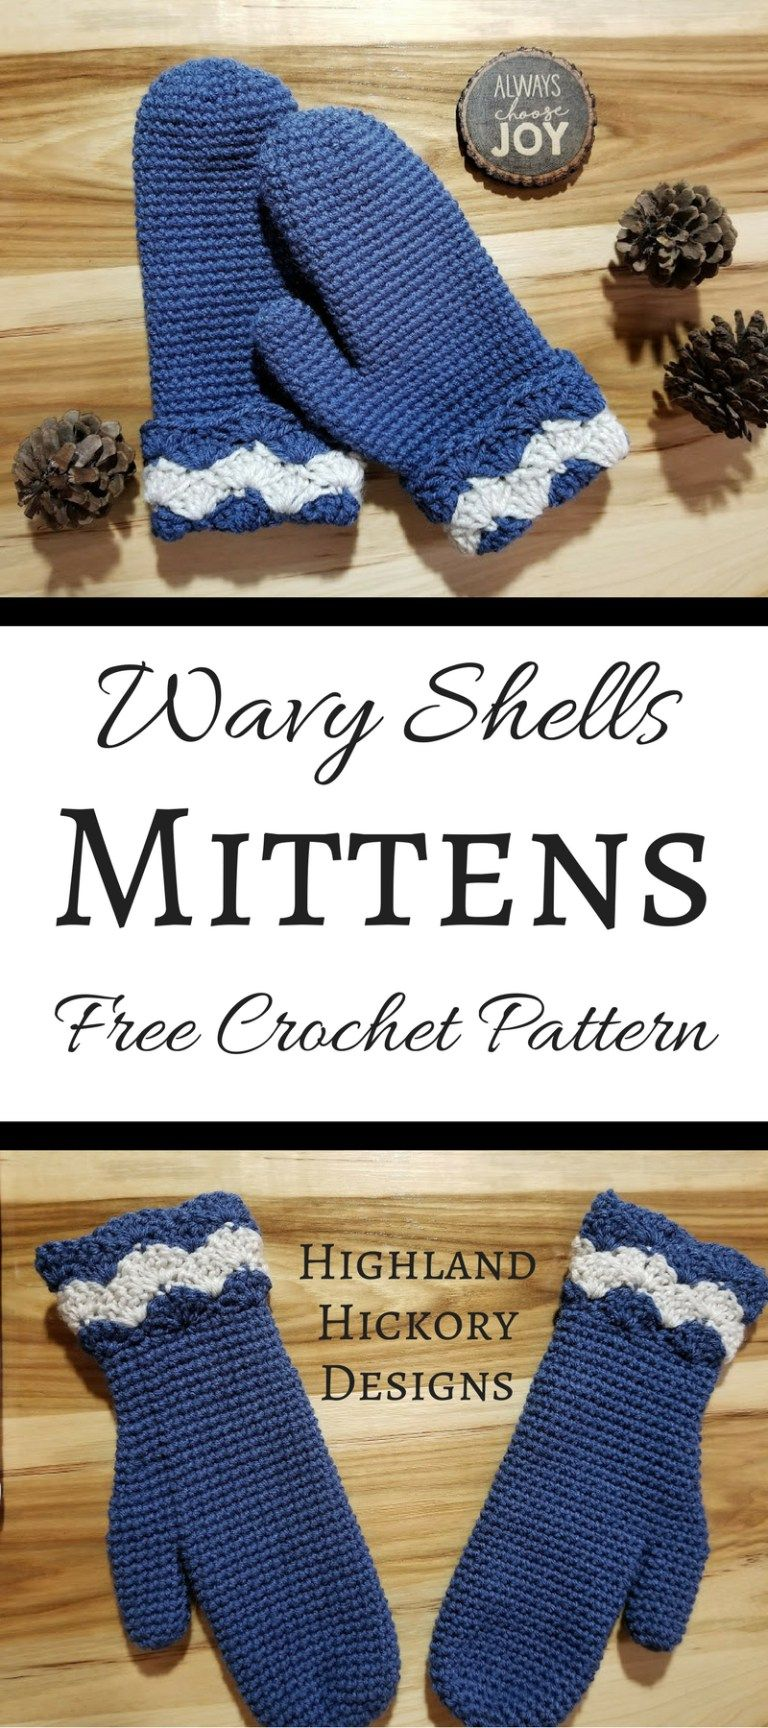 Wavy Shells Mittens | Gifts to Make | Pinterest | Crochet, Crochet ...